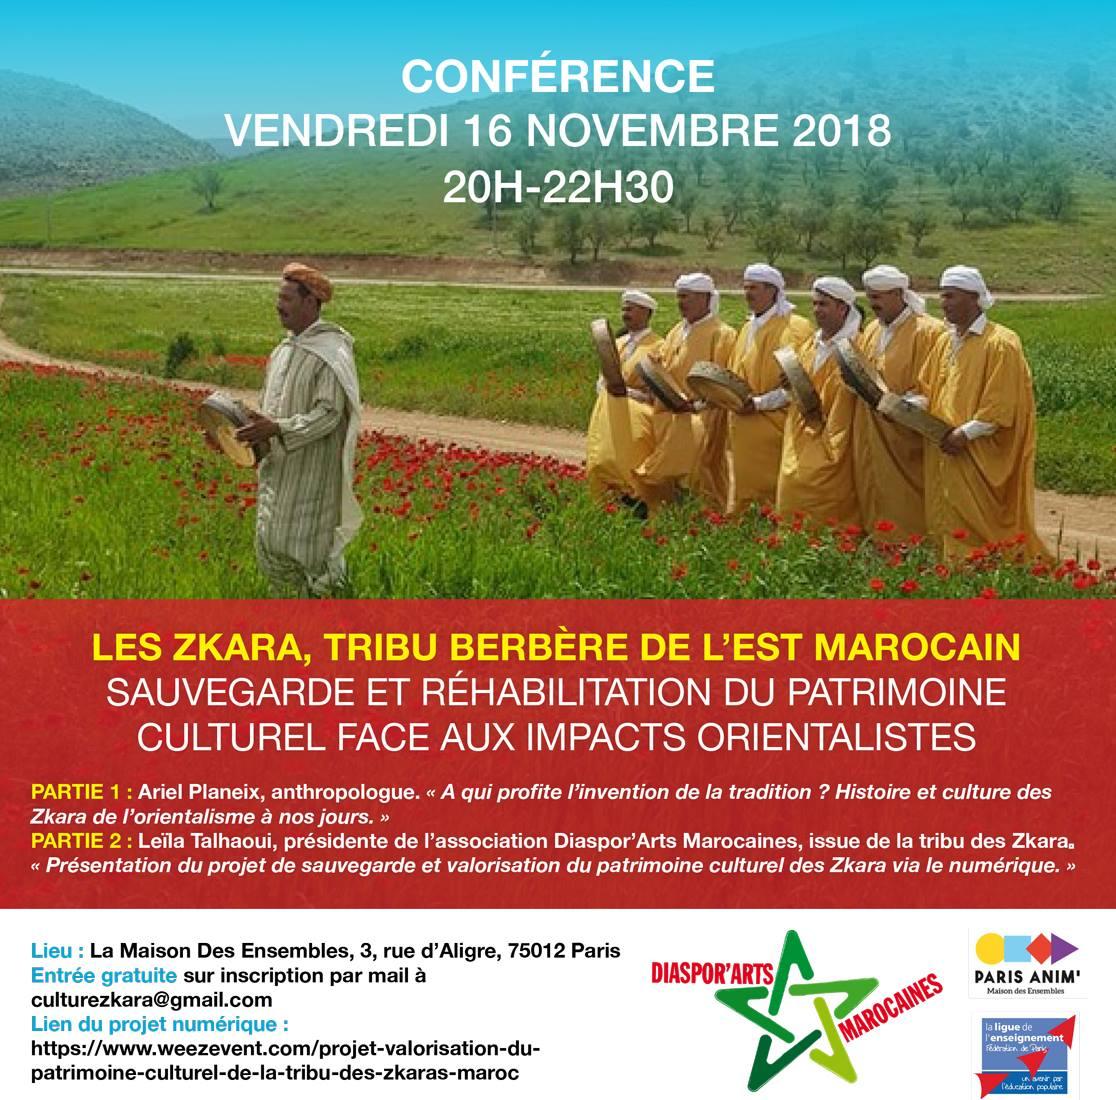 Conférence : les Zkara, tribu